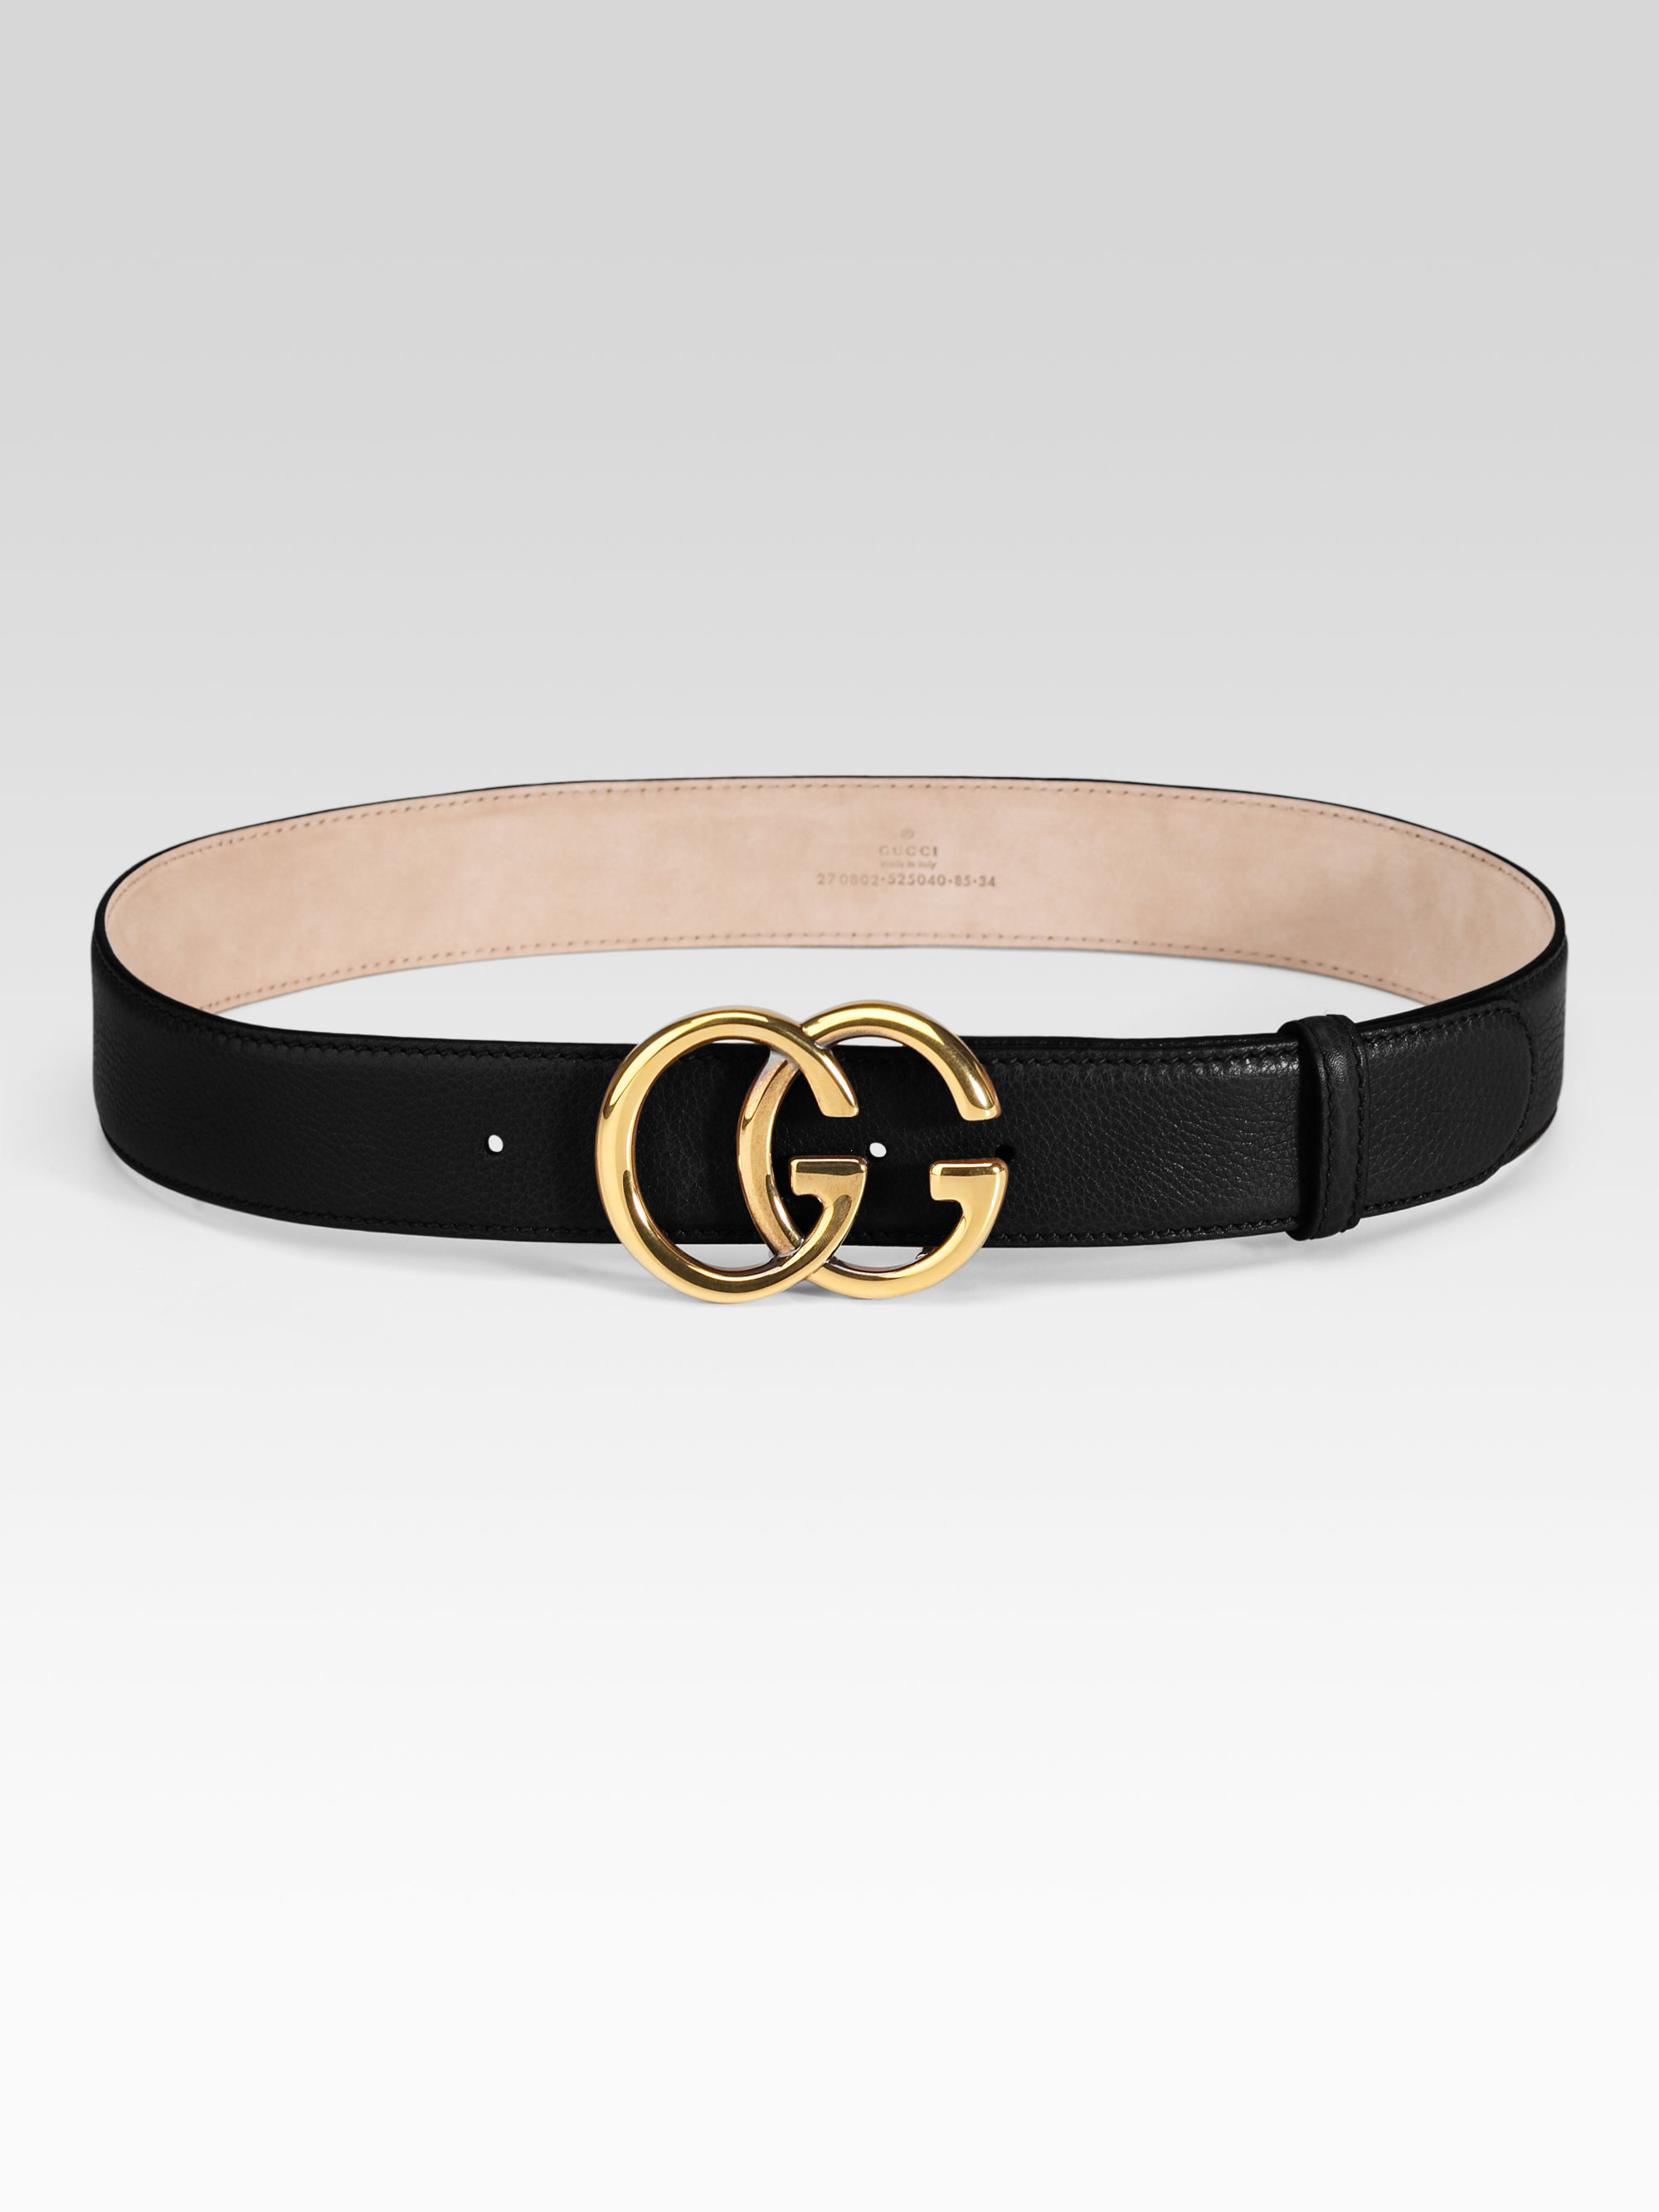 Gucci Double G Buckle Belt In Black For Men Lyst